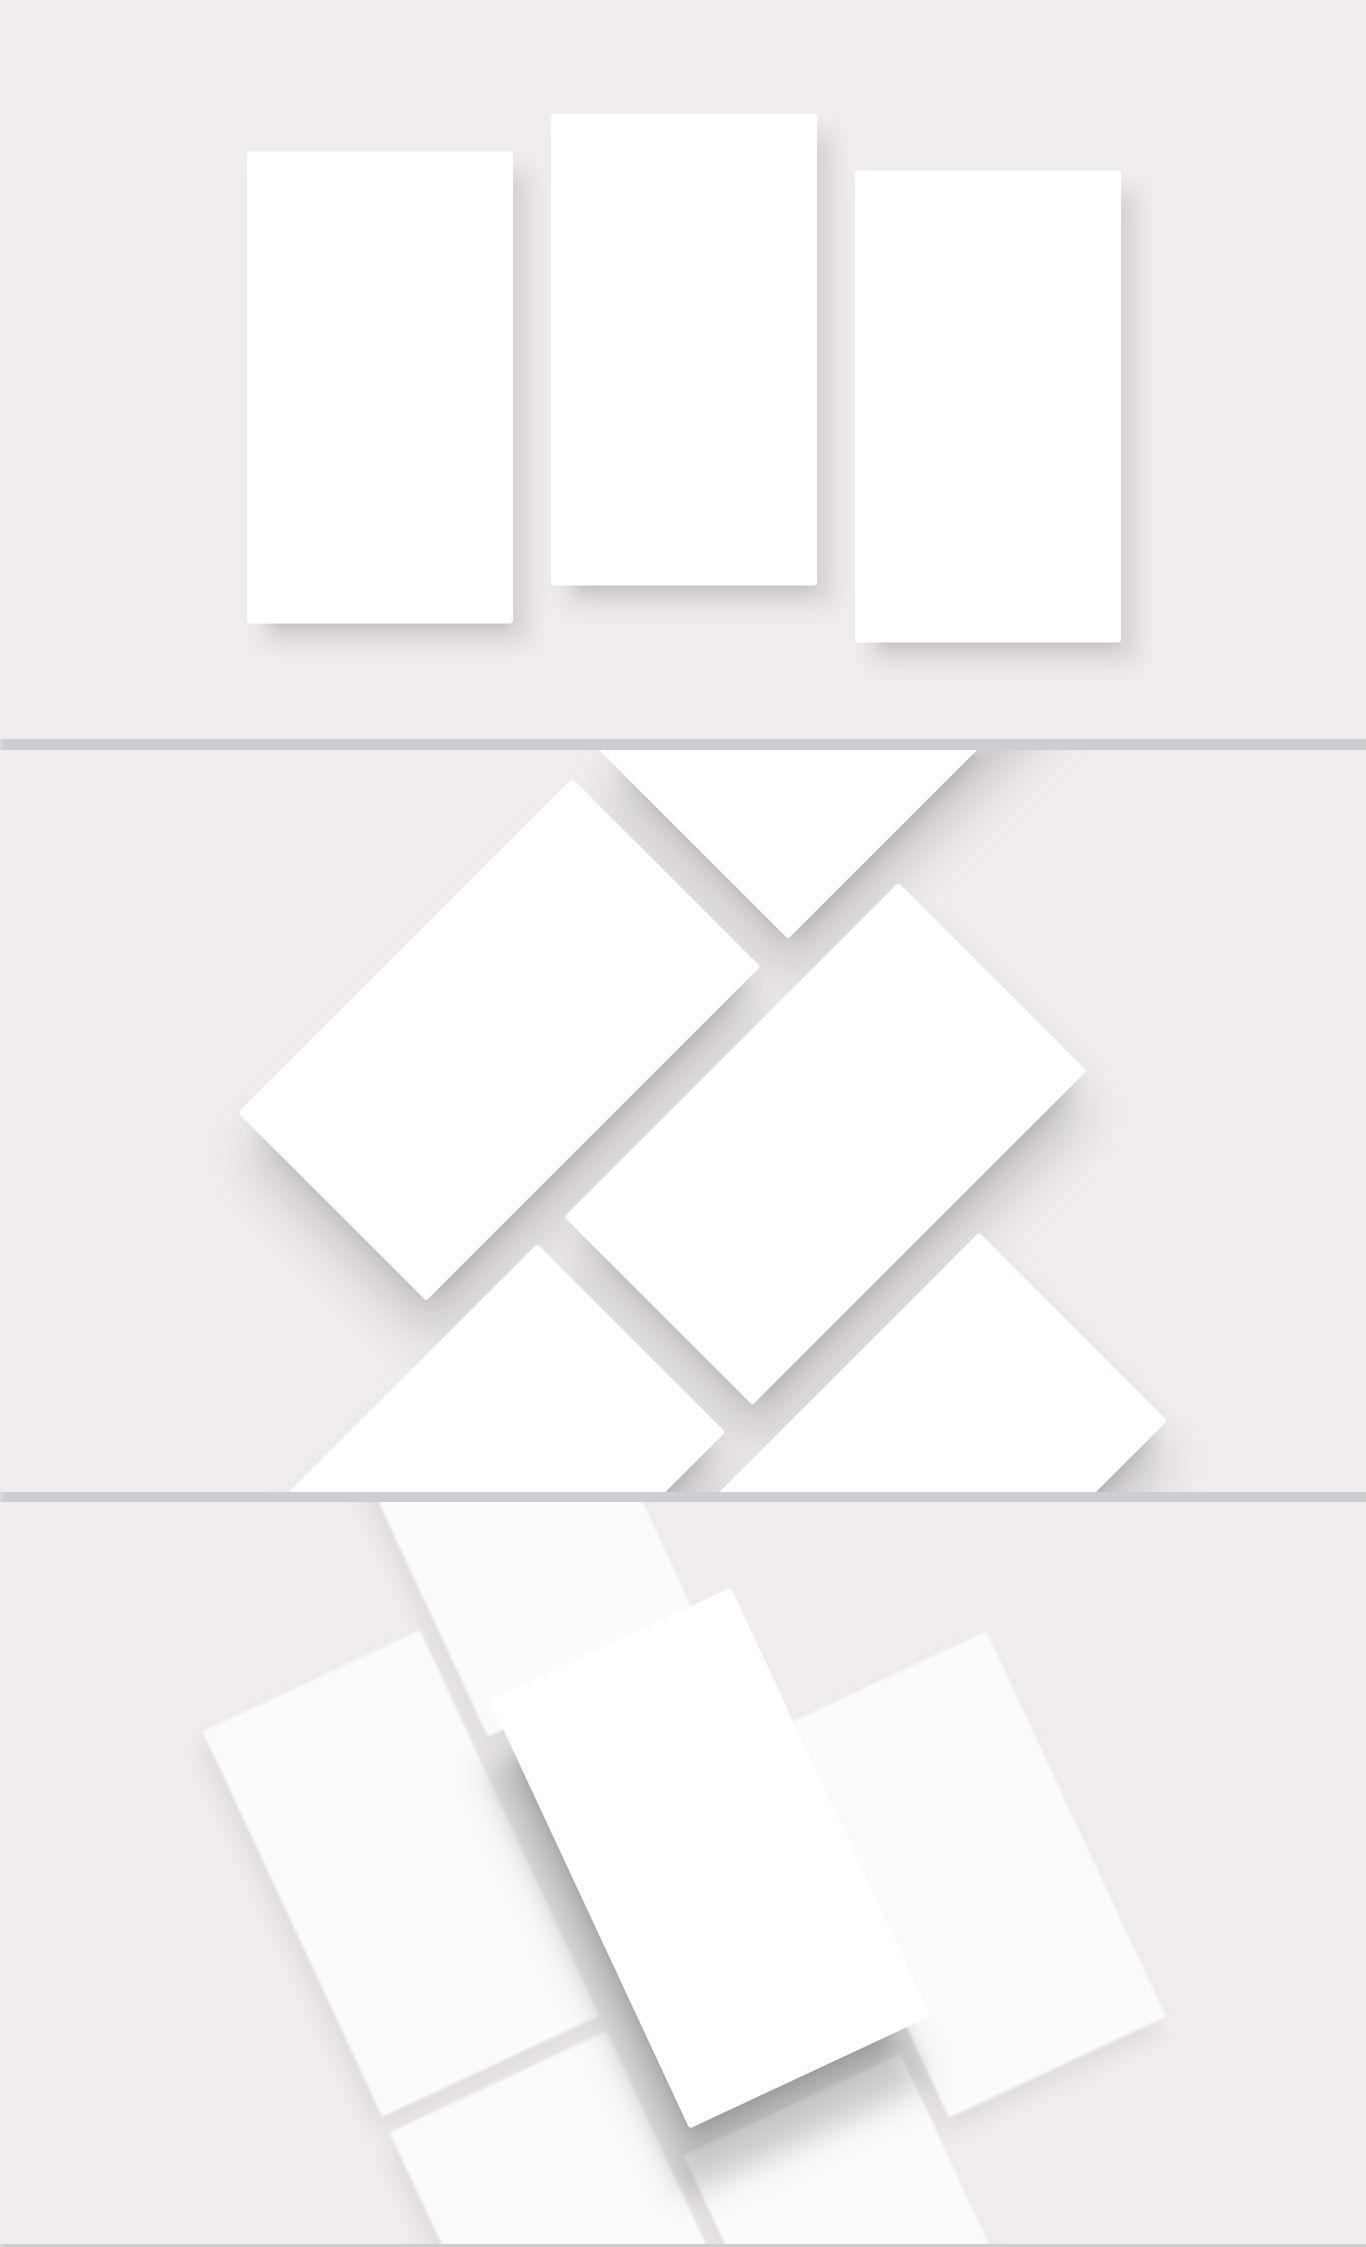 Free Mobile Screen Mockup Templates Mockup Mockup Templates Mobile Mockup